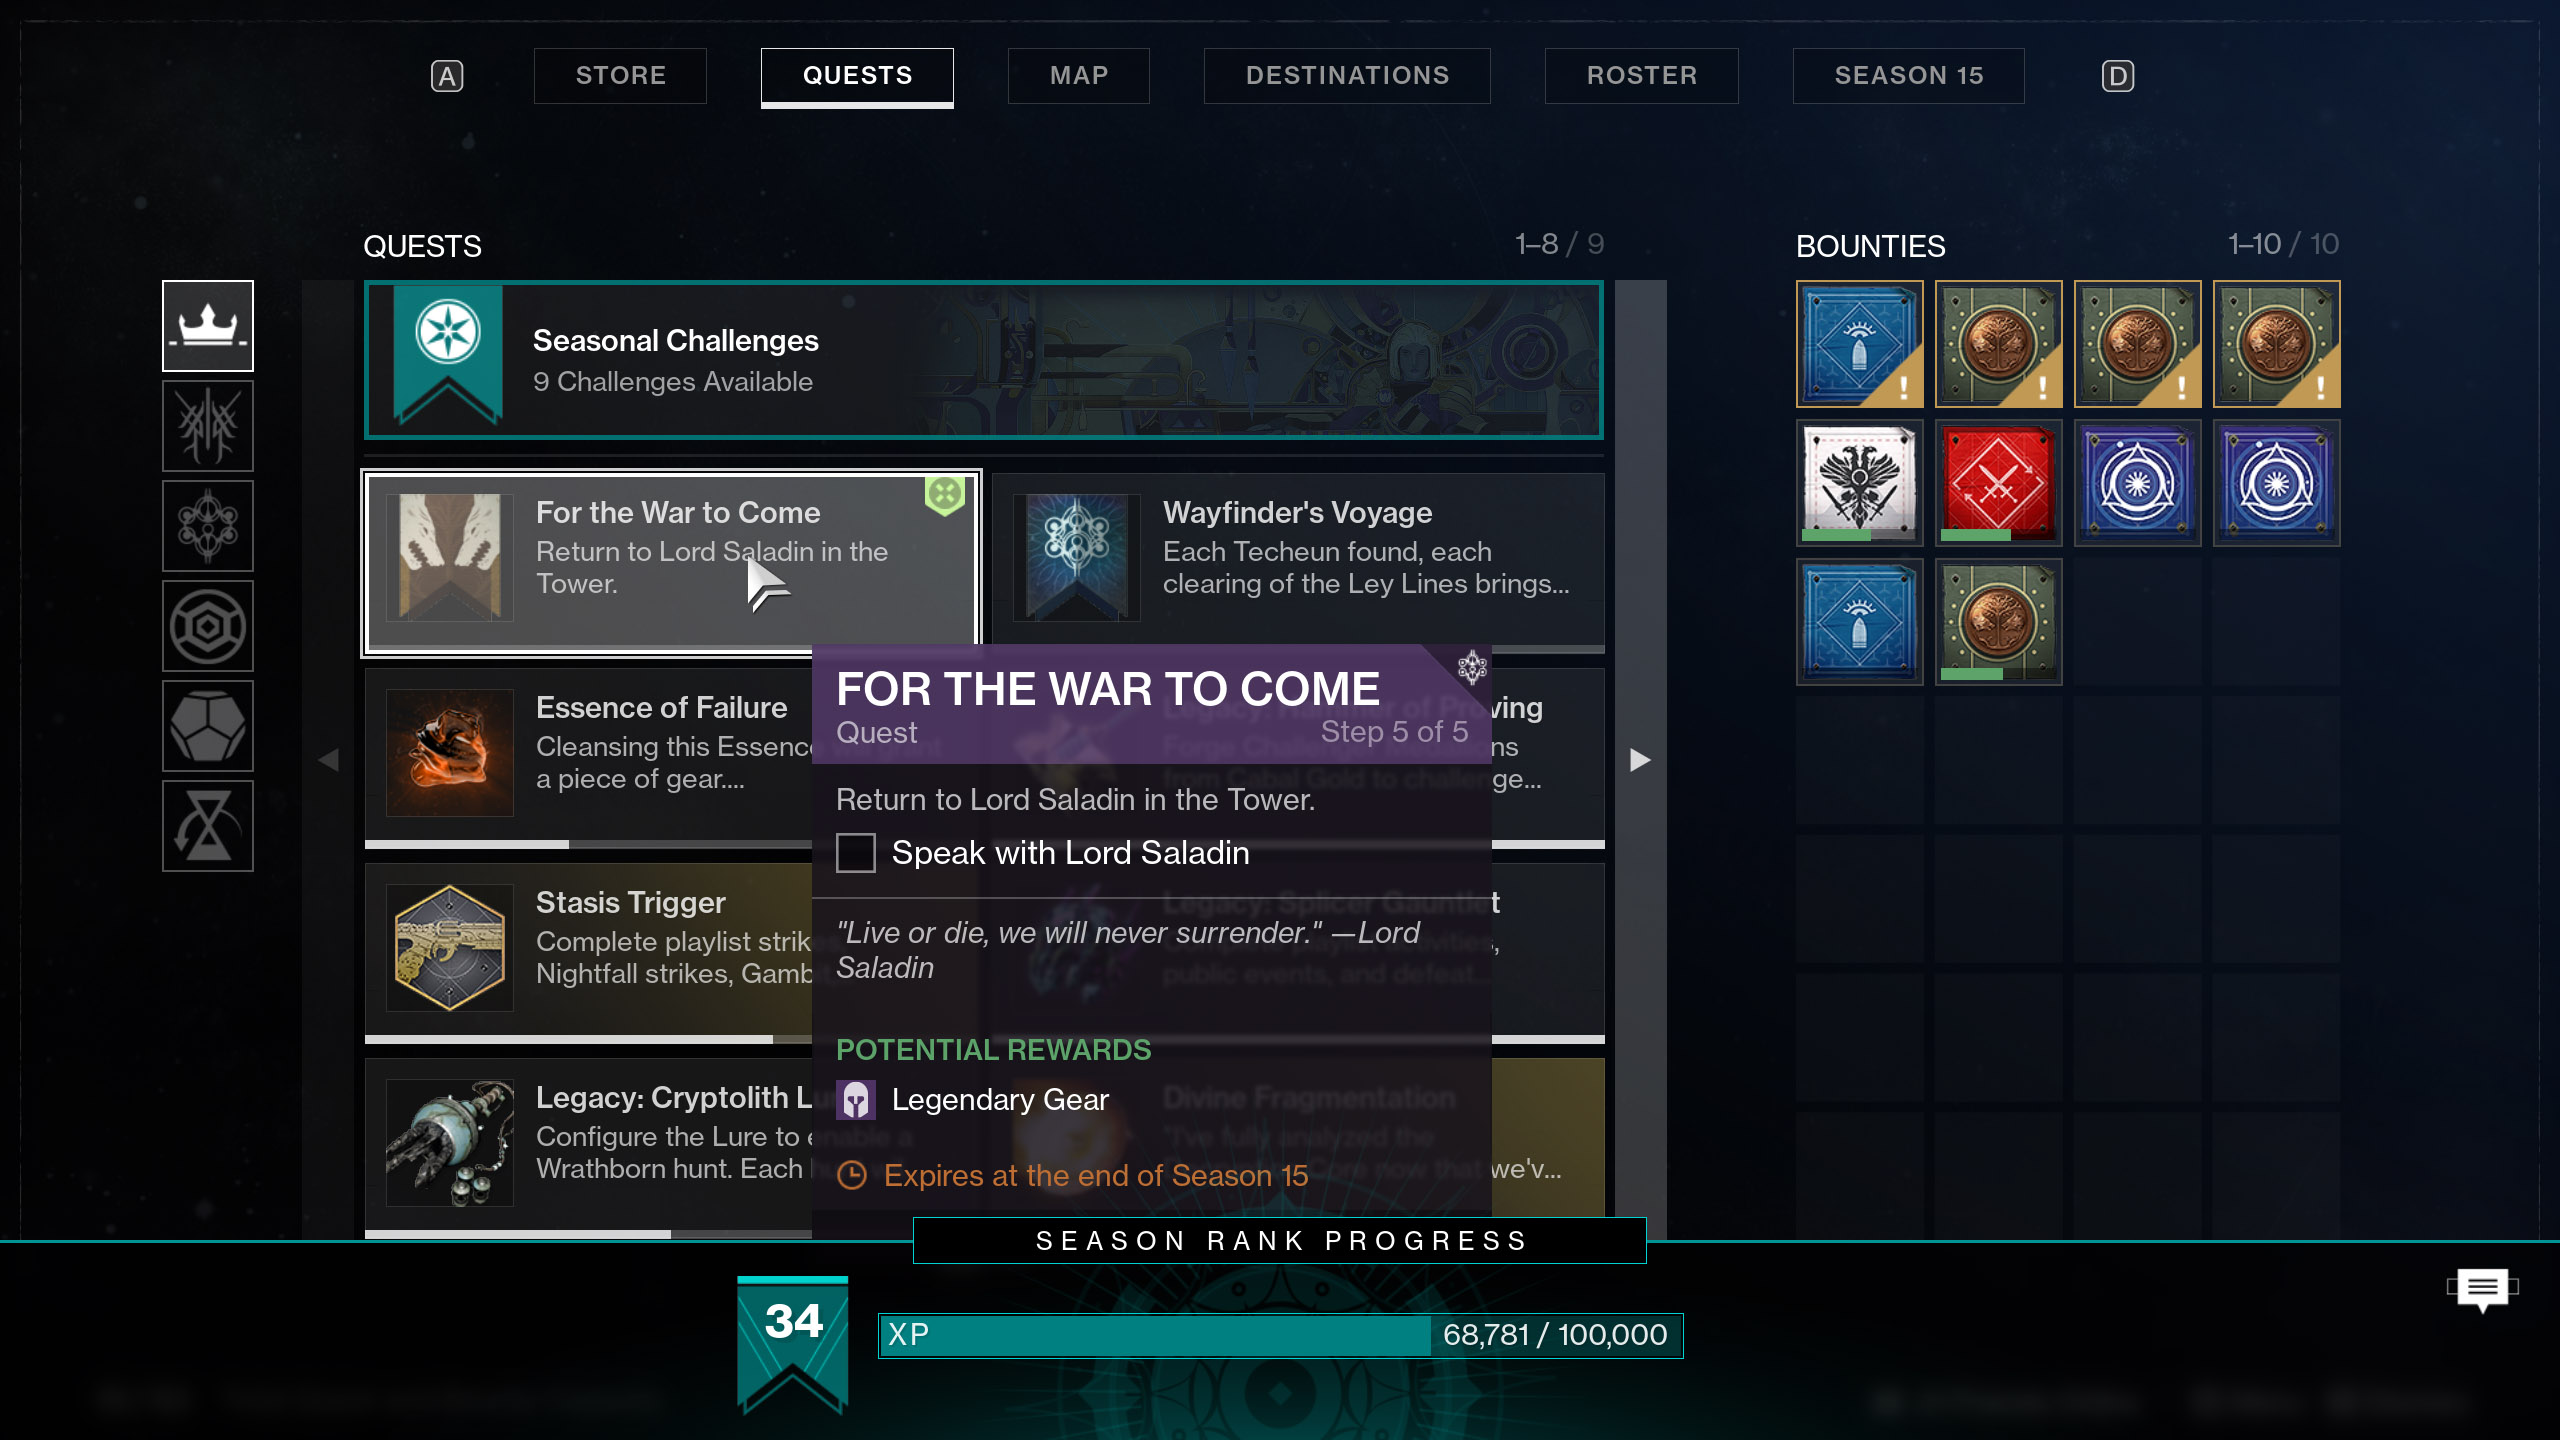 destiny 2 iron banner season 15 quest